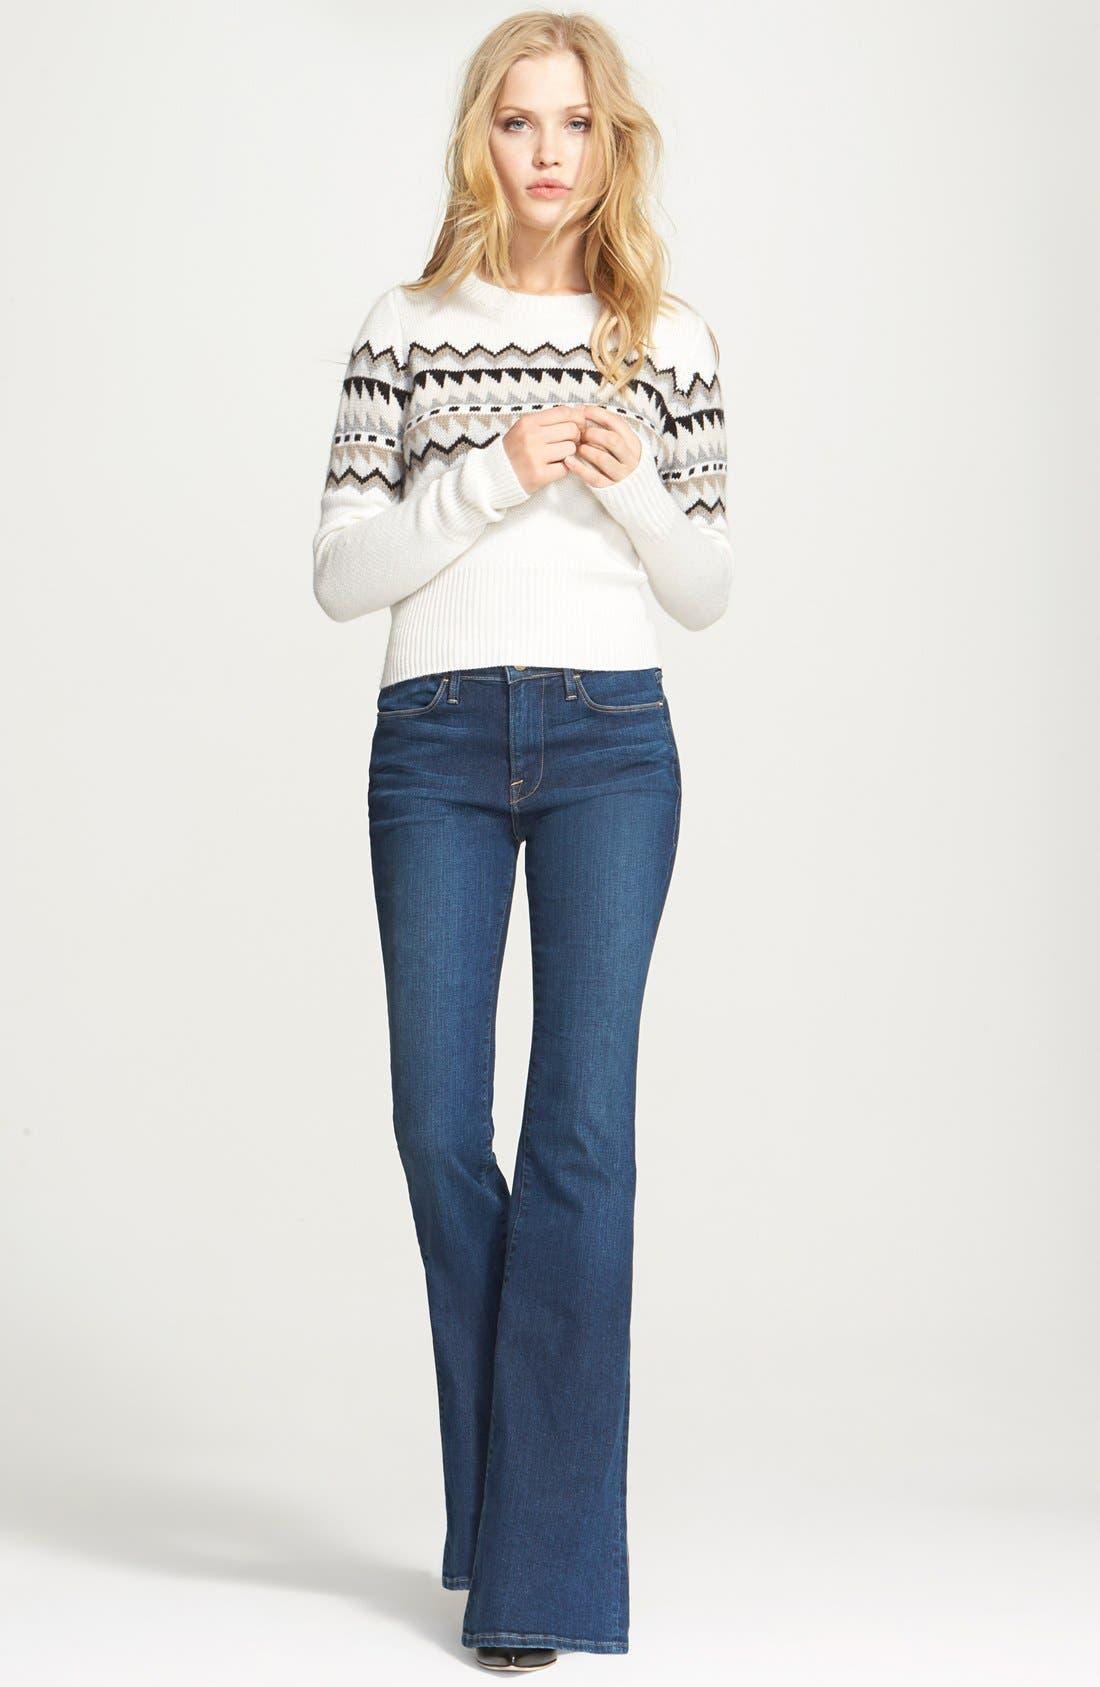 FRAME, Denim 'Le High Flare' Flare Leg Jeans, Alternate thumbnail 2, color, 401